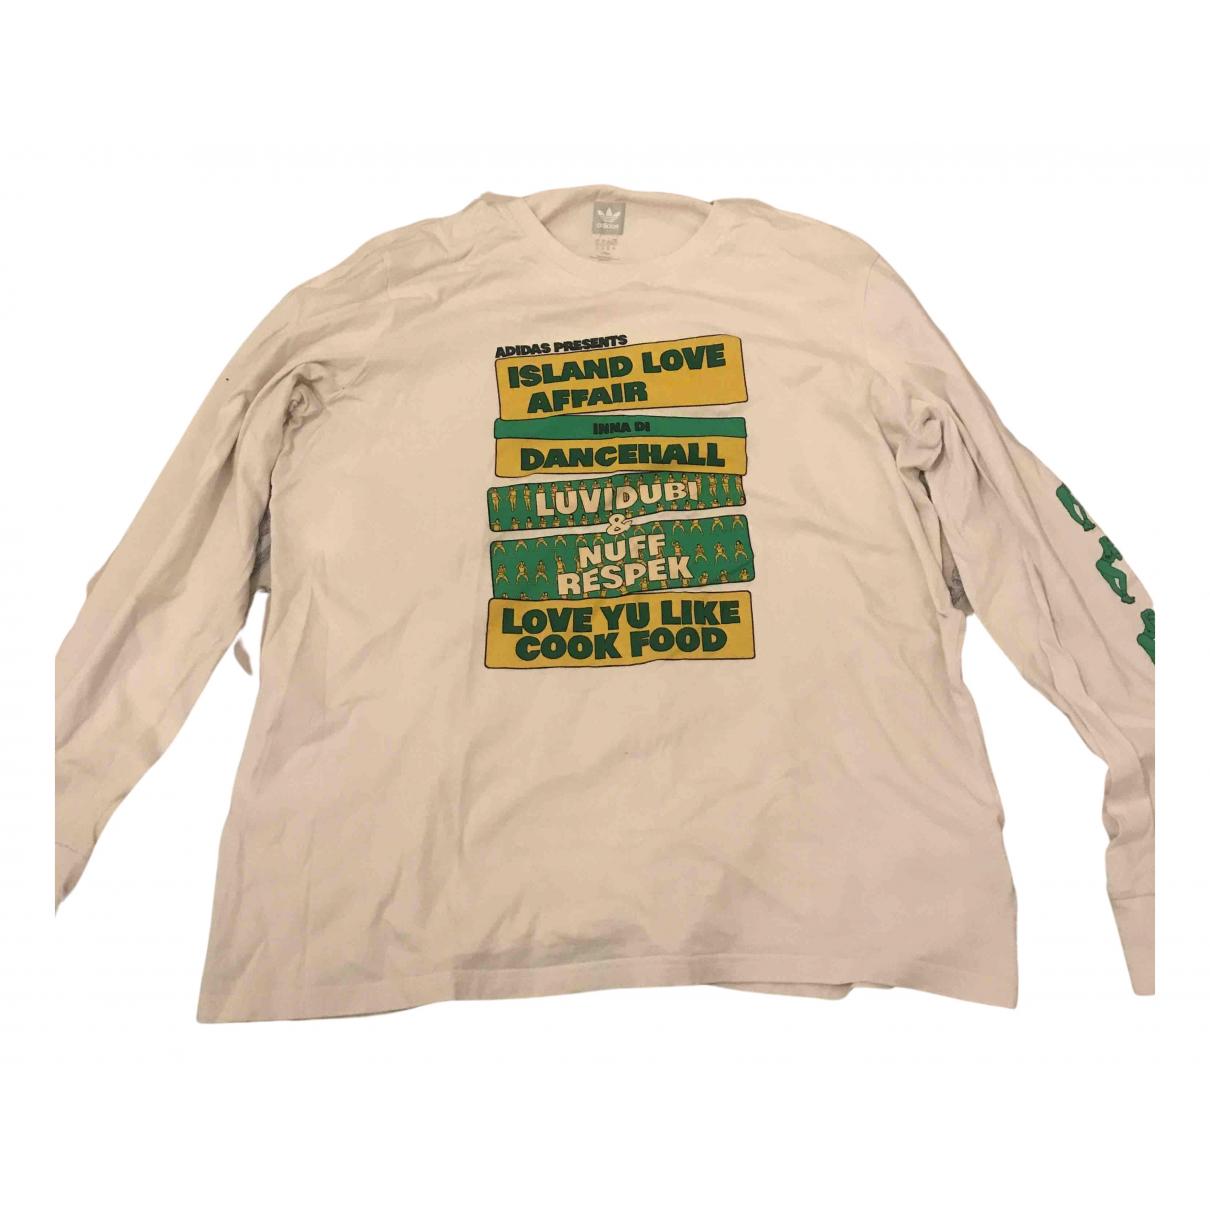 Adidas - Tee shirts   pour homme en coton - blanc